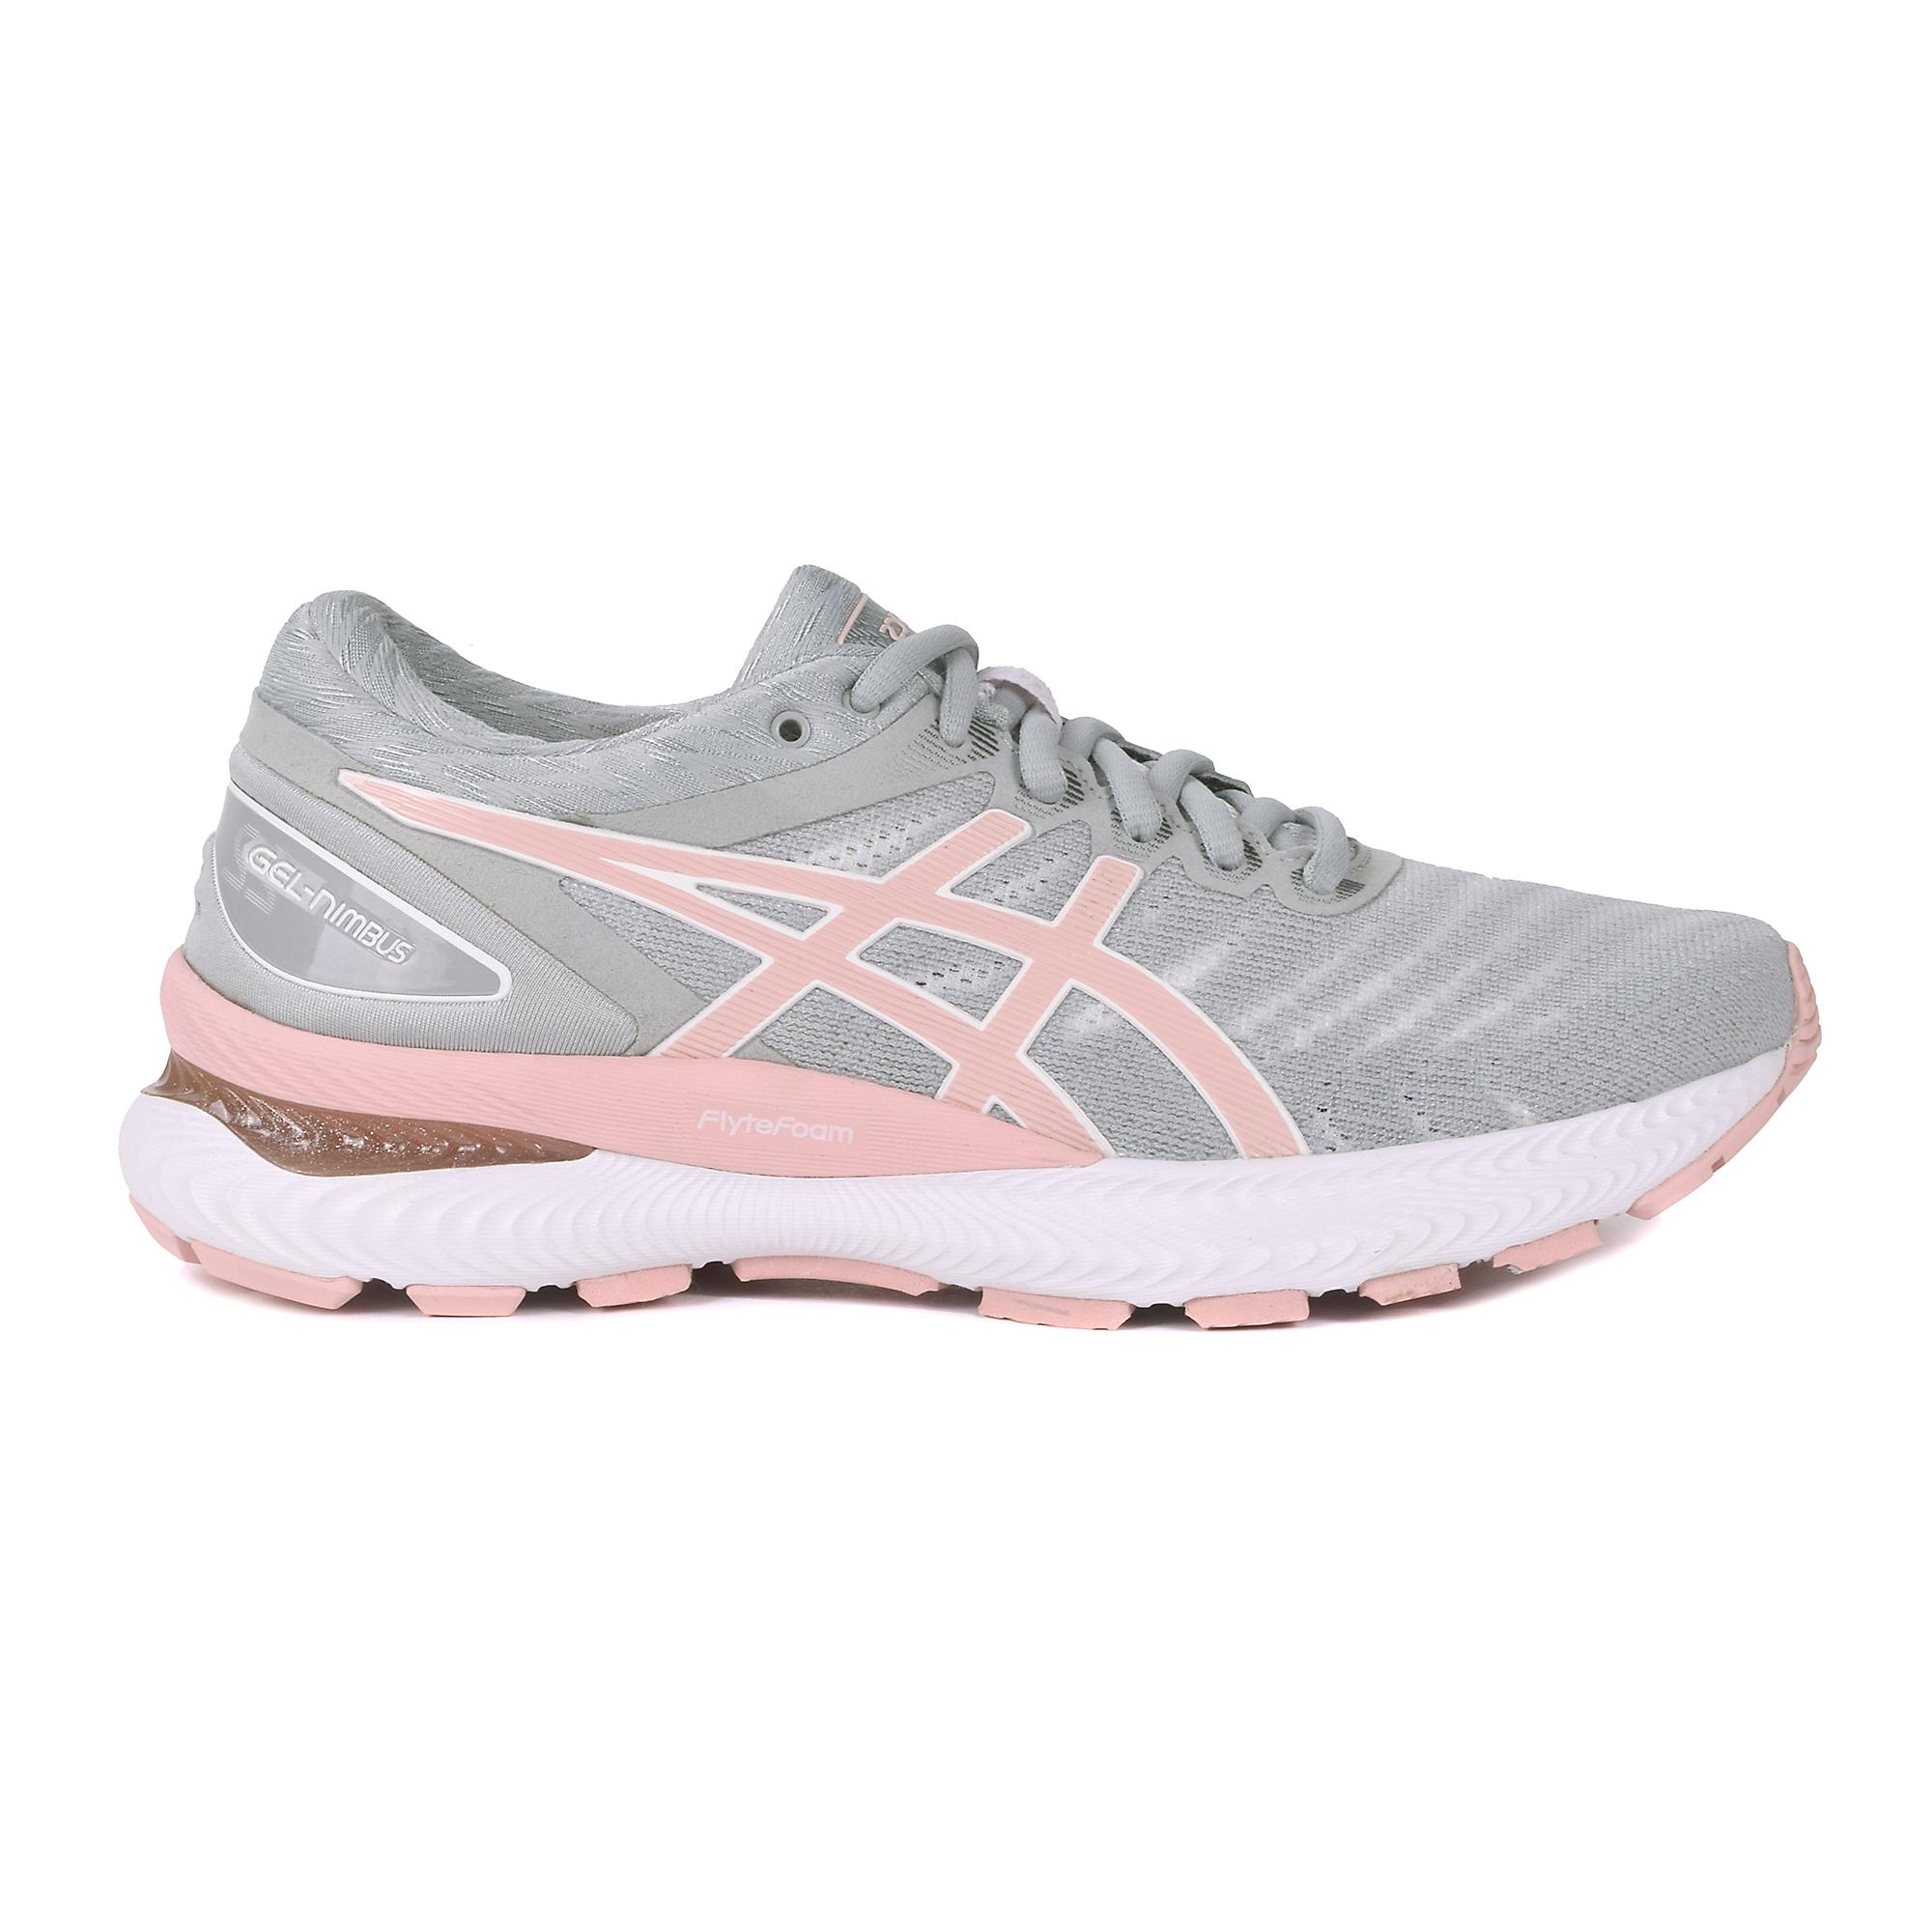 Women's Asics Gel-Nimbus 22 Running Shoe - Color: White/Rose Gold (Regular Width) - Size: 5, White, large, image 1